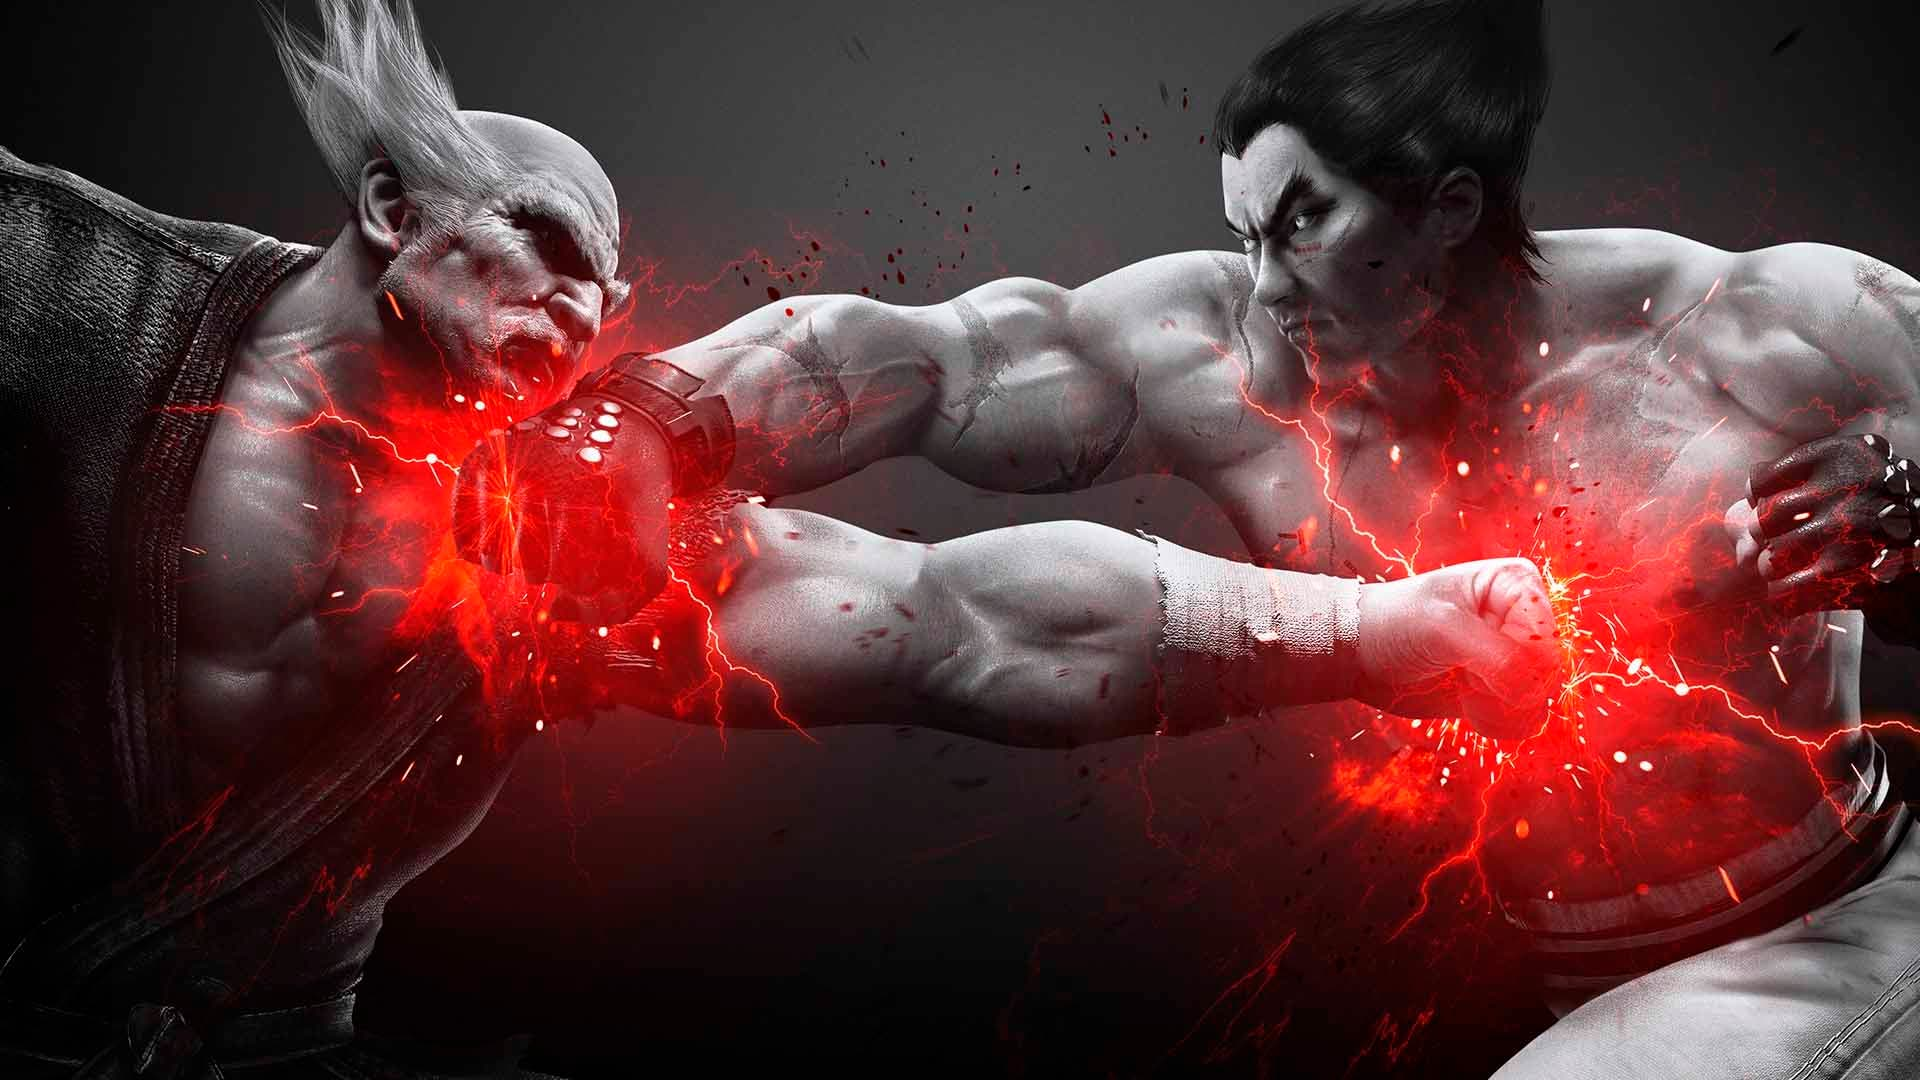 Desvelados los luchadores que llegarán a Tekken 7 a través del Pase de Temporada 3 9